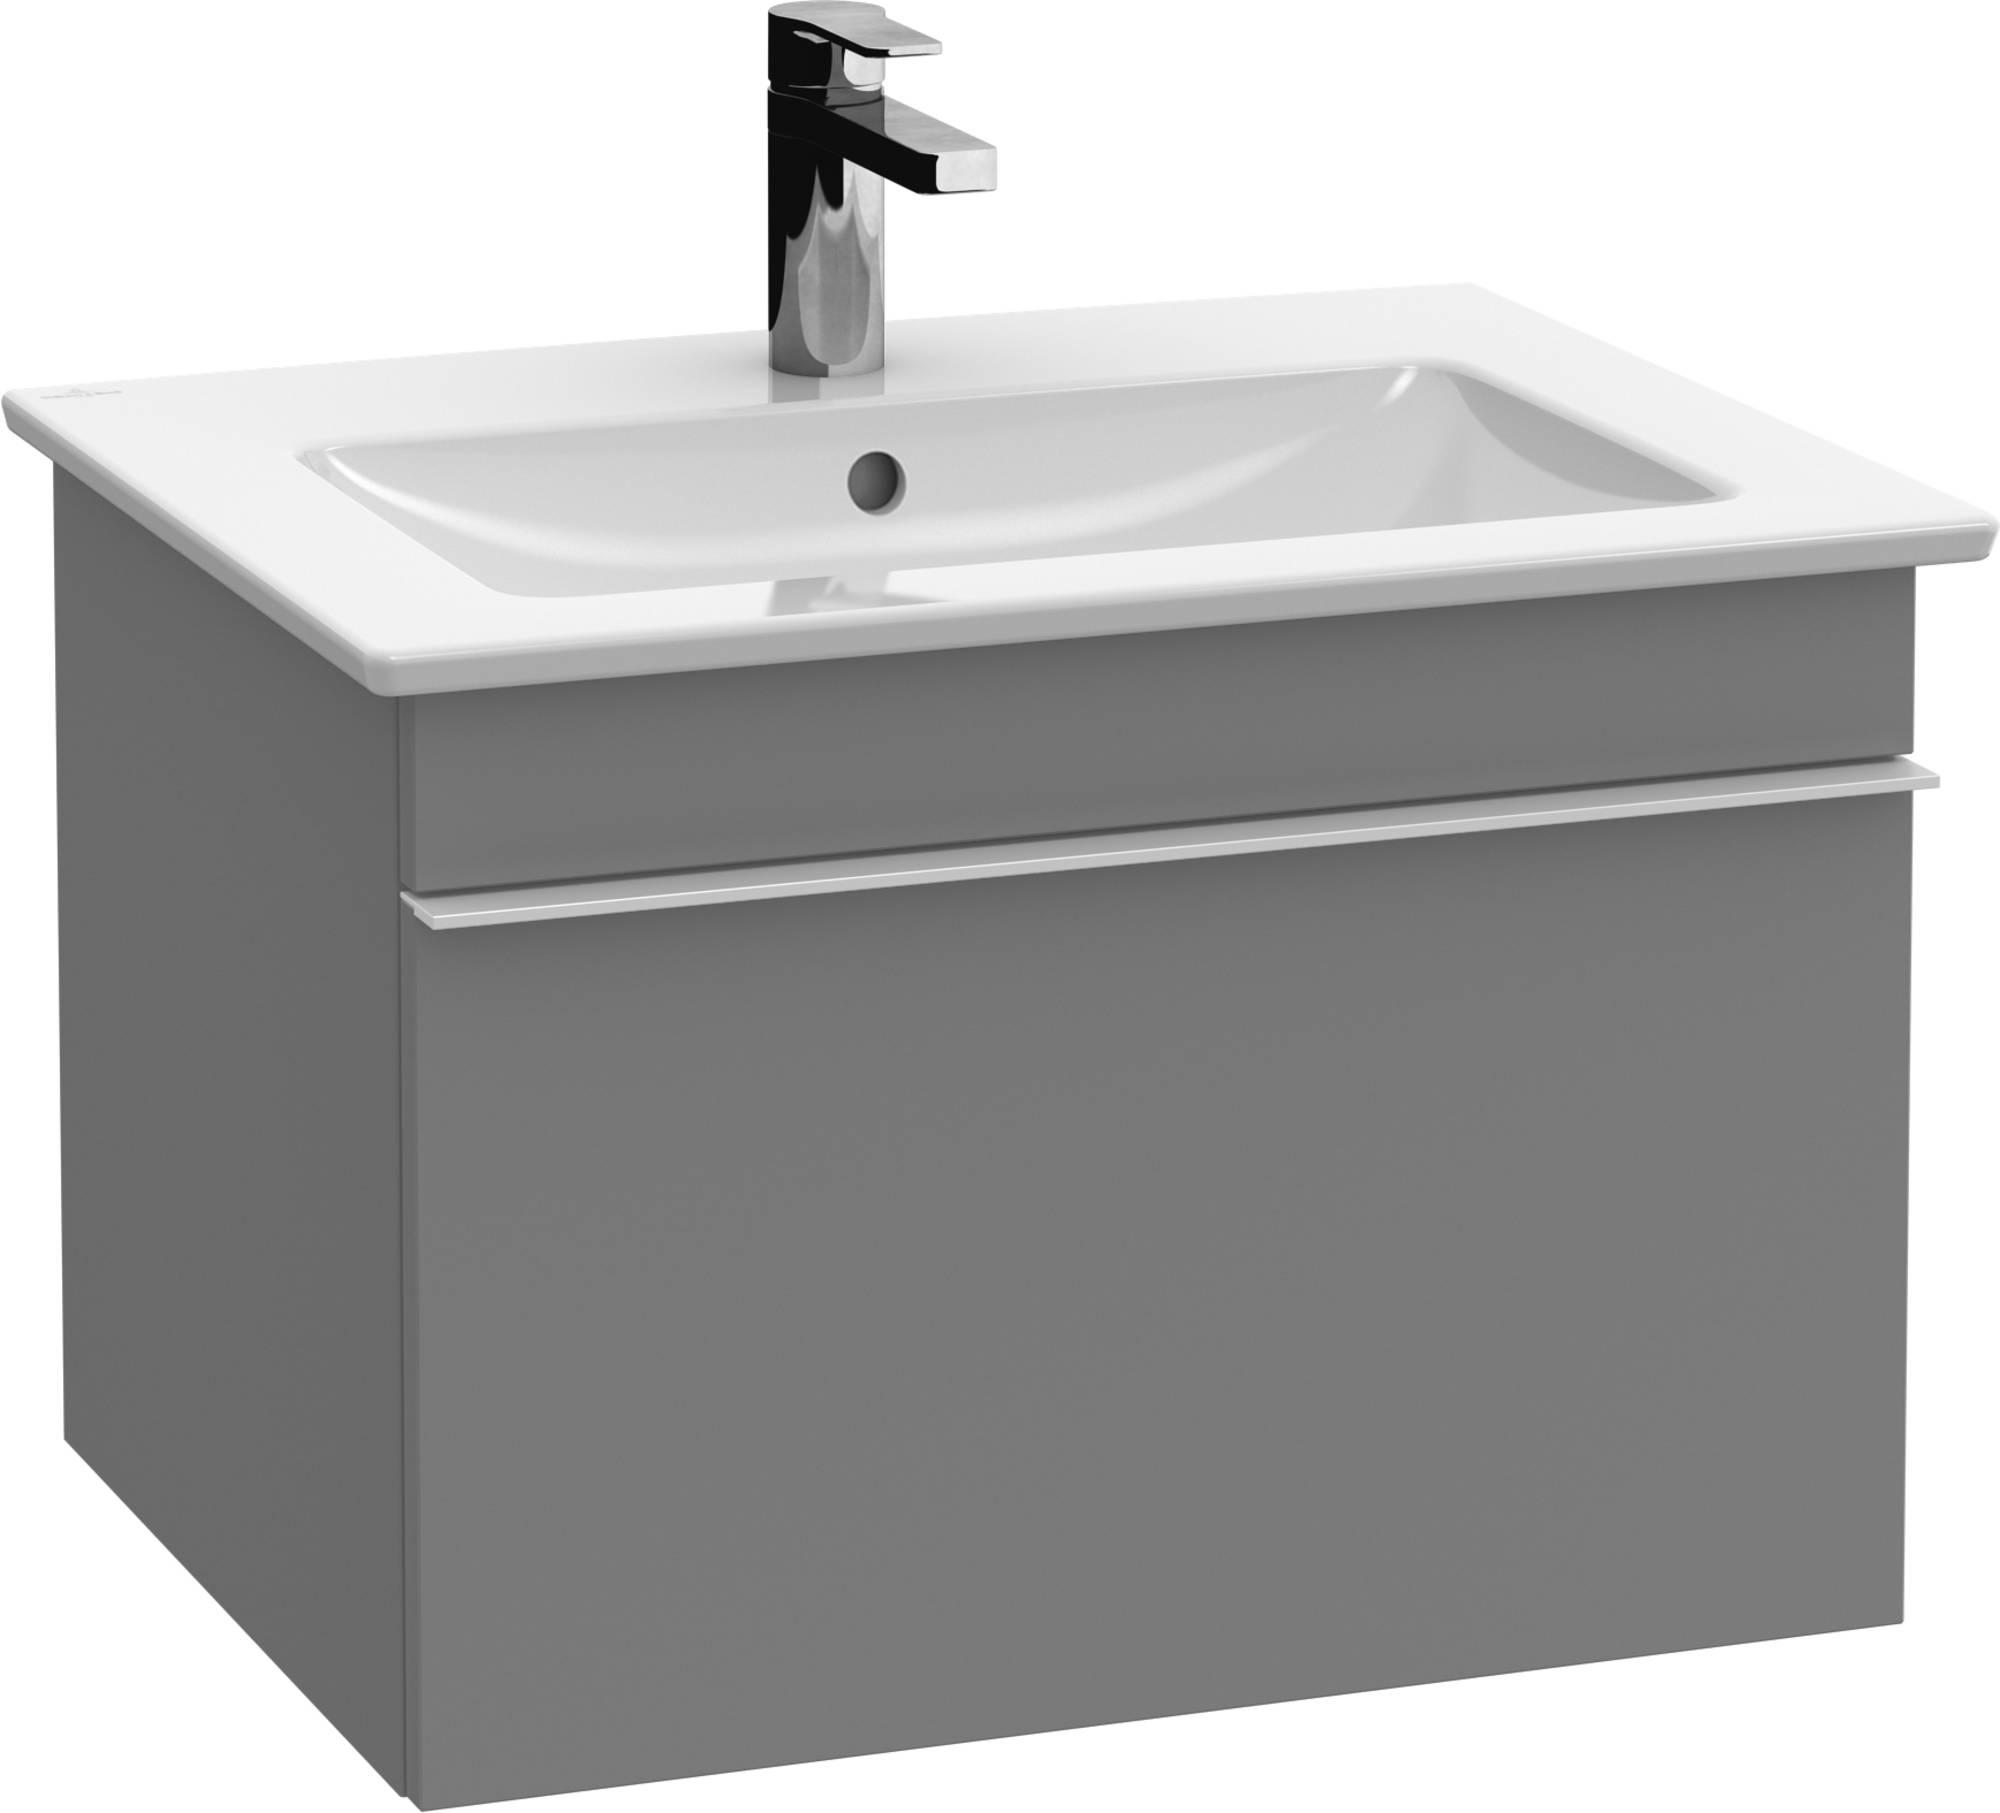 Villeroy&Boch Venticello Wastafelonderkast 60,3x50,2x42  cm  Glossy Grey